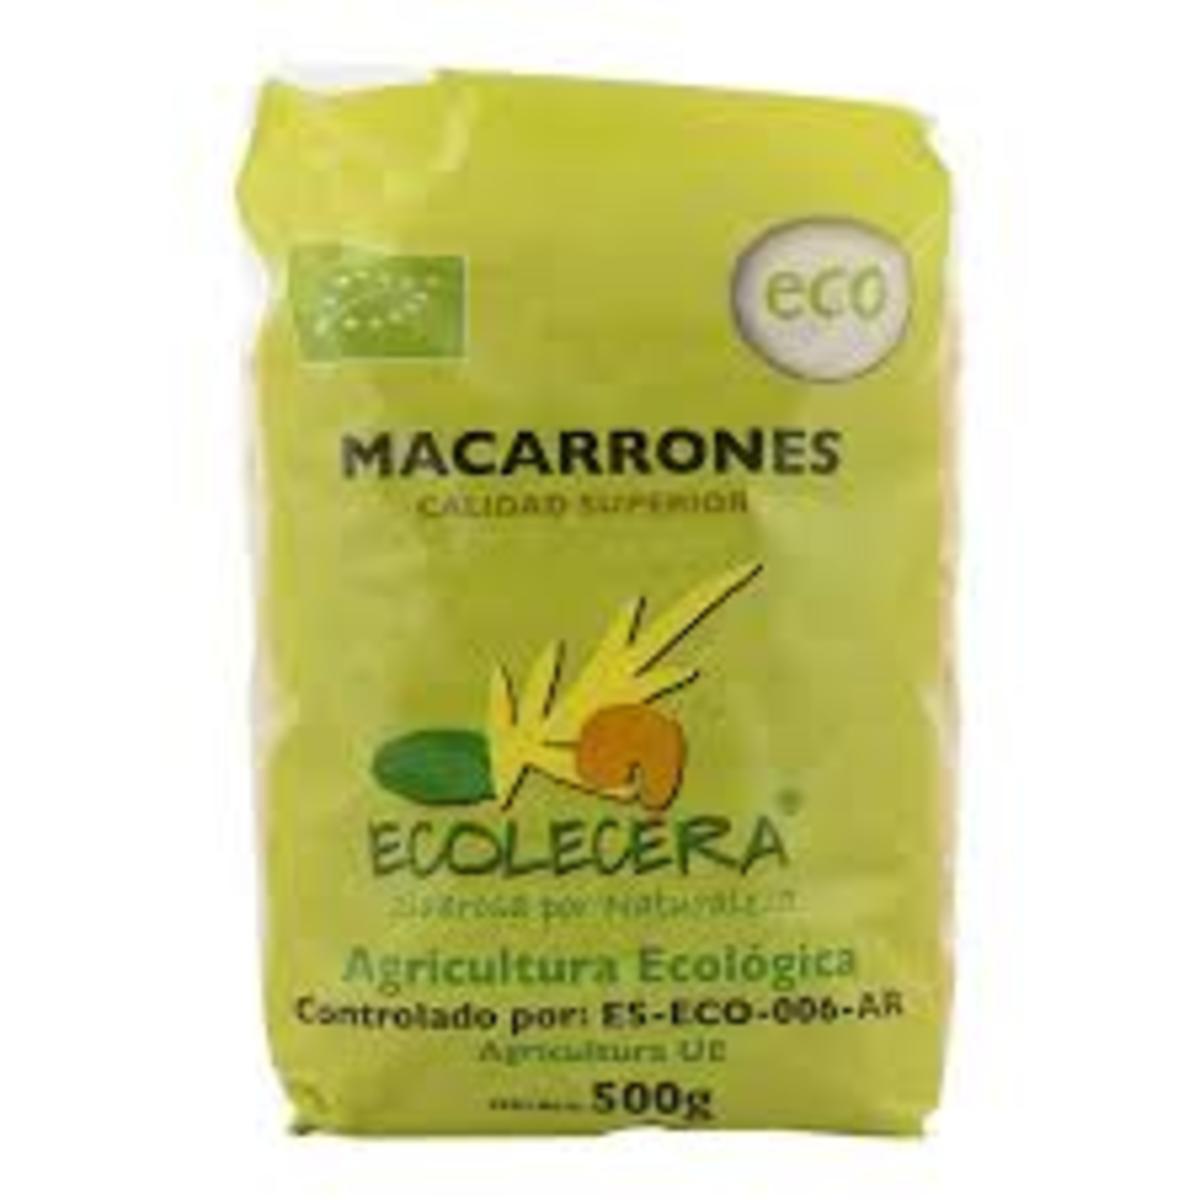 Macarrones Ecológicos 500G. Ecolécera